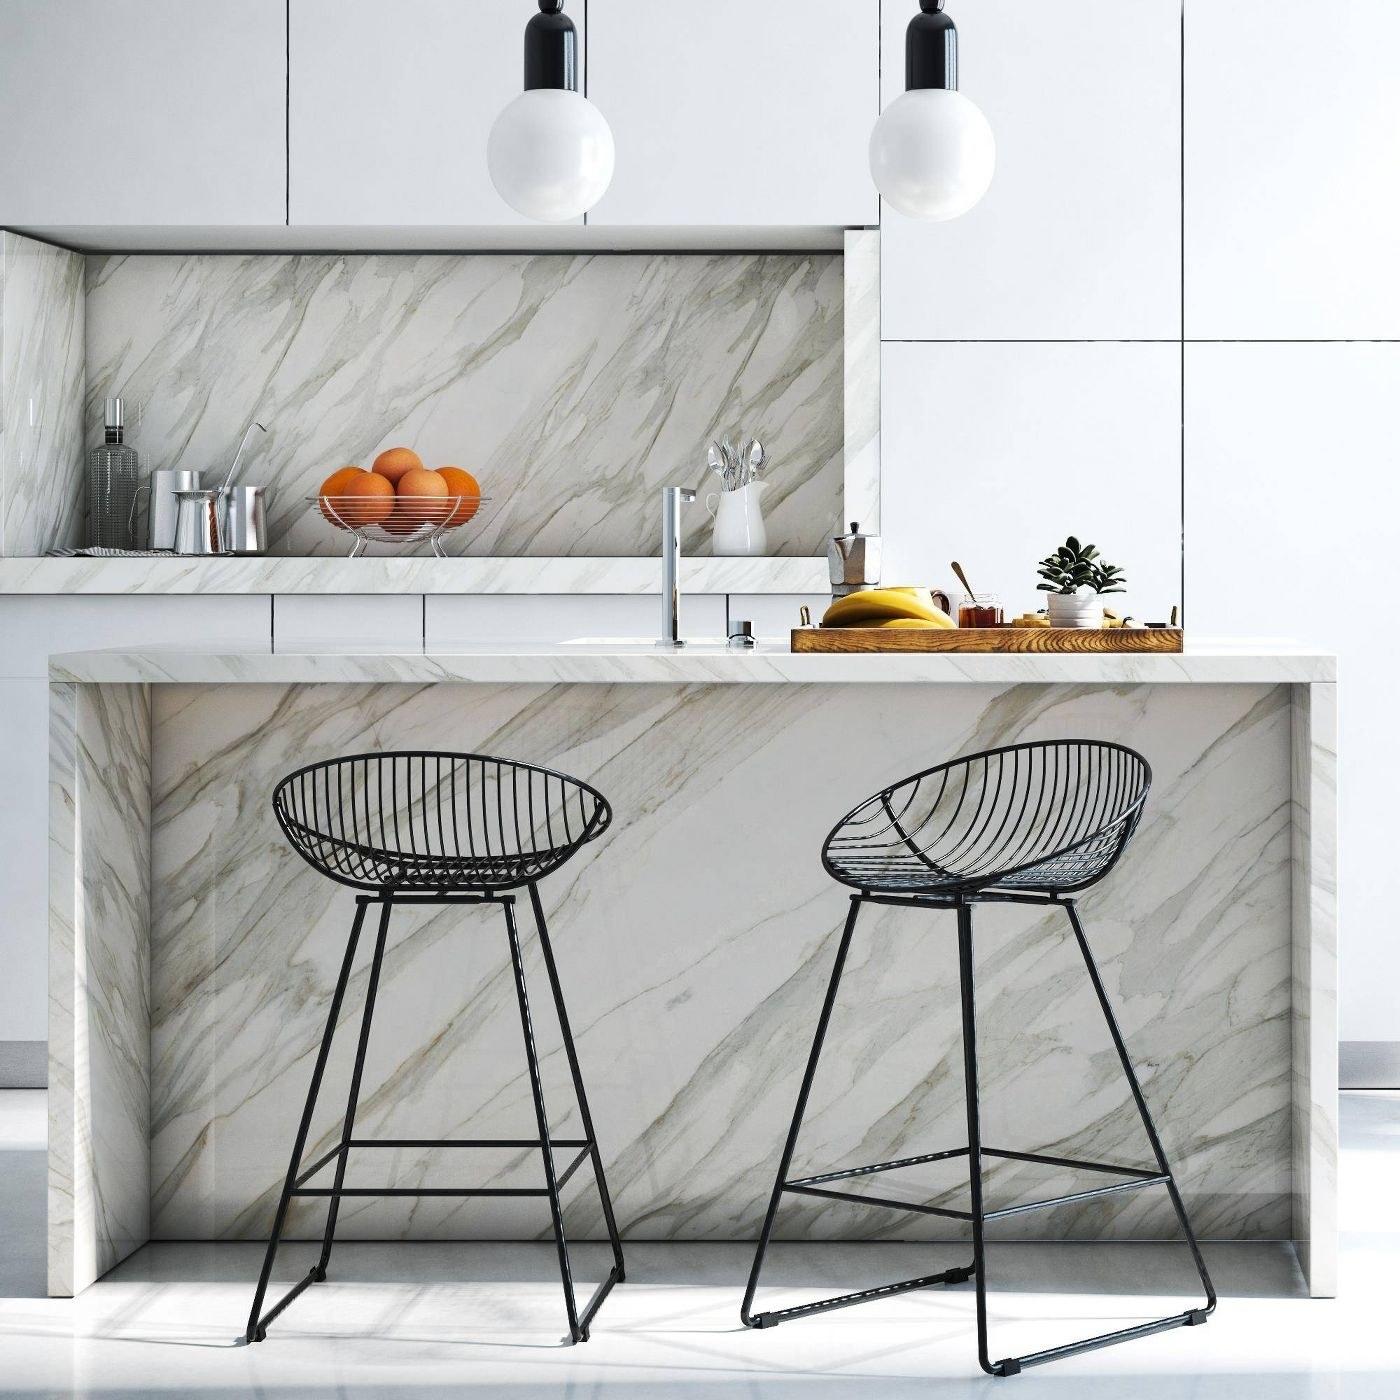 black wire bar stools at a kitchen island